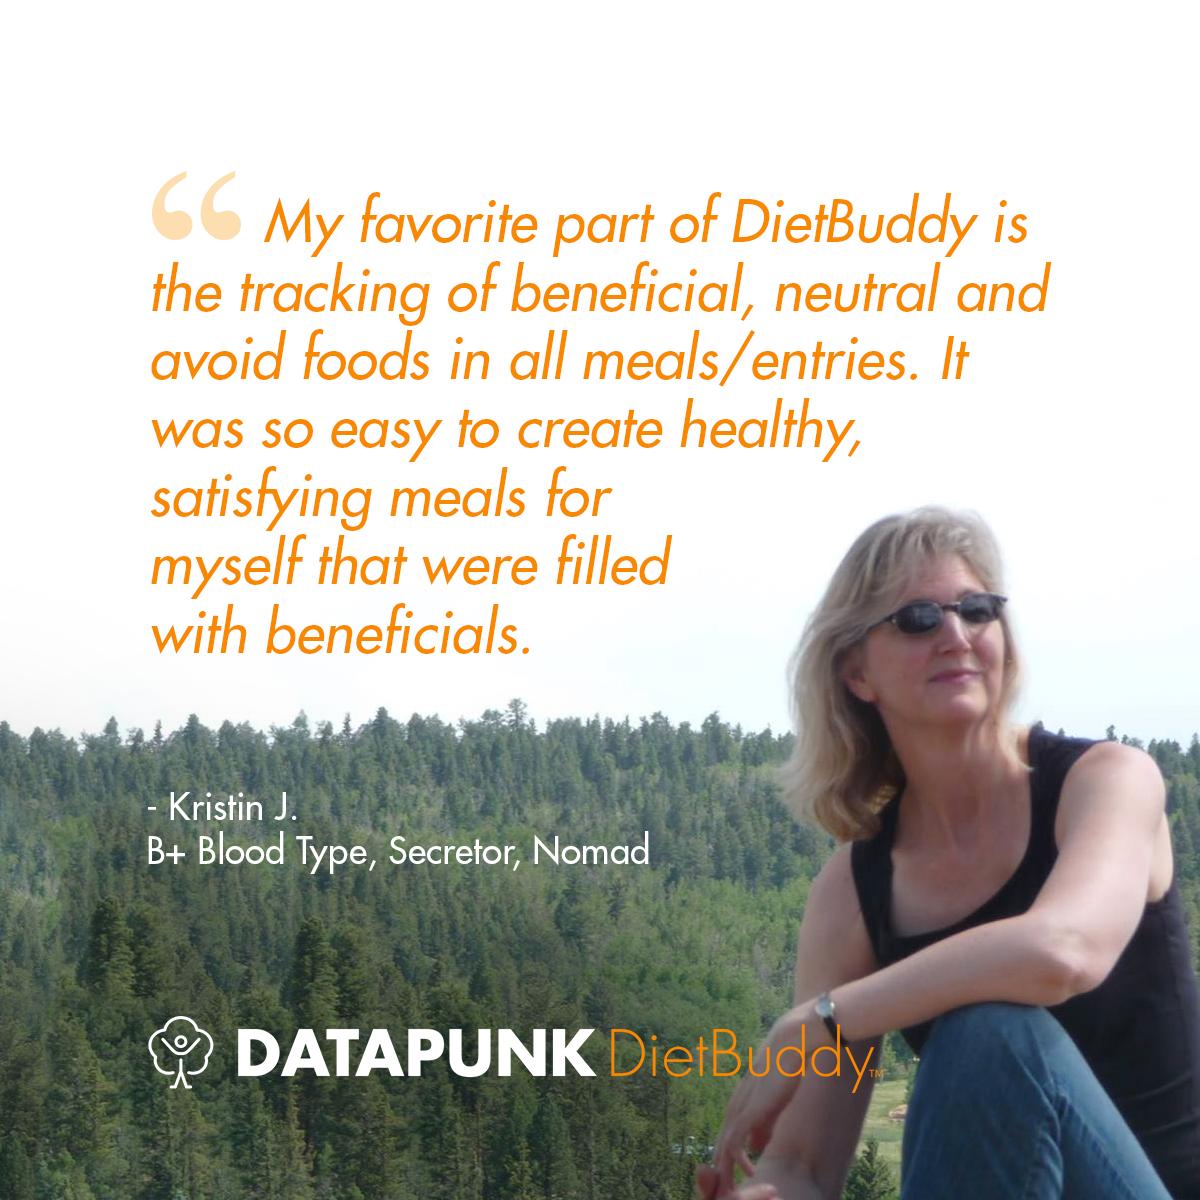 Kristin J. - DietBuddy Testimonial